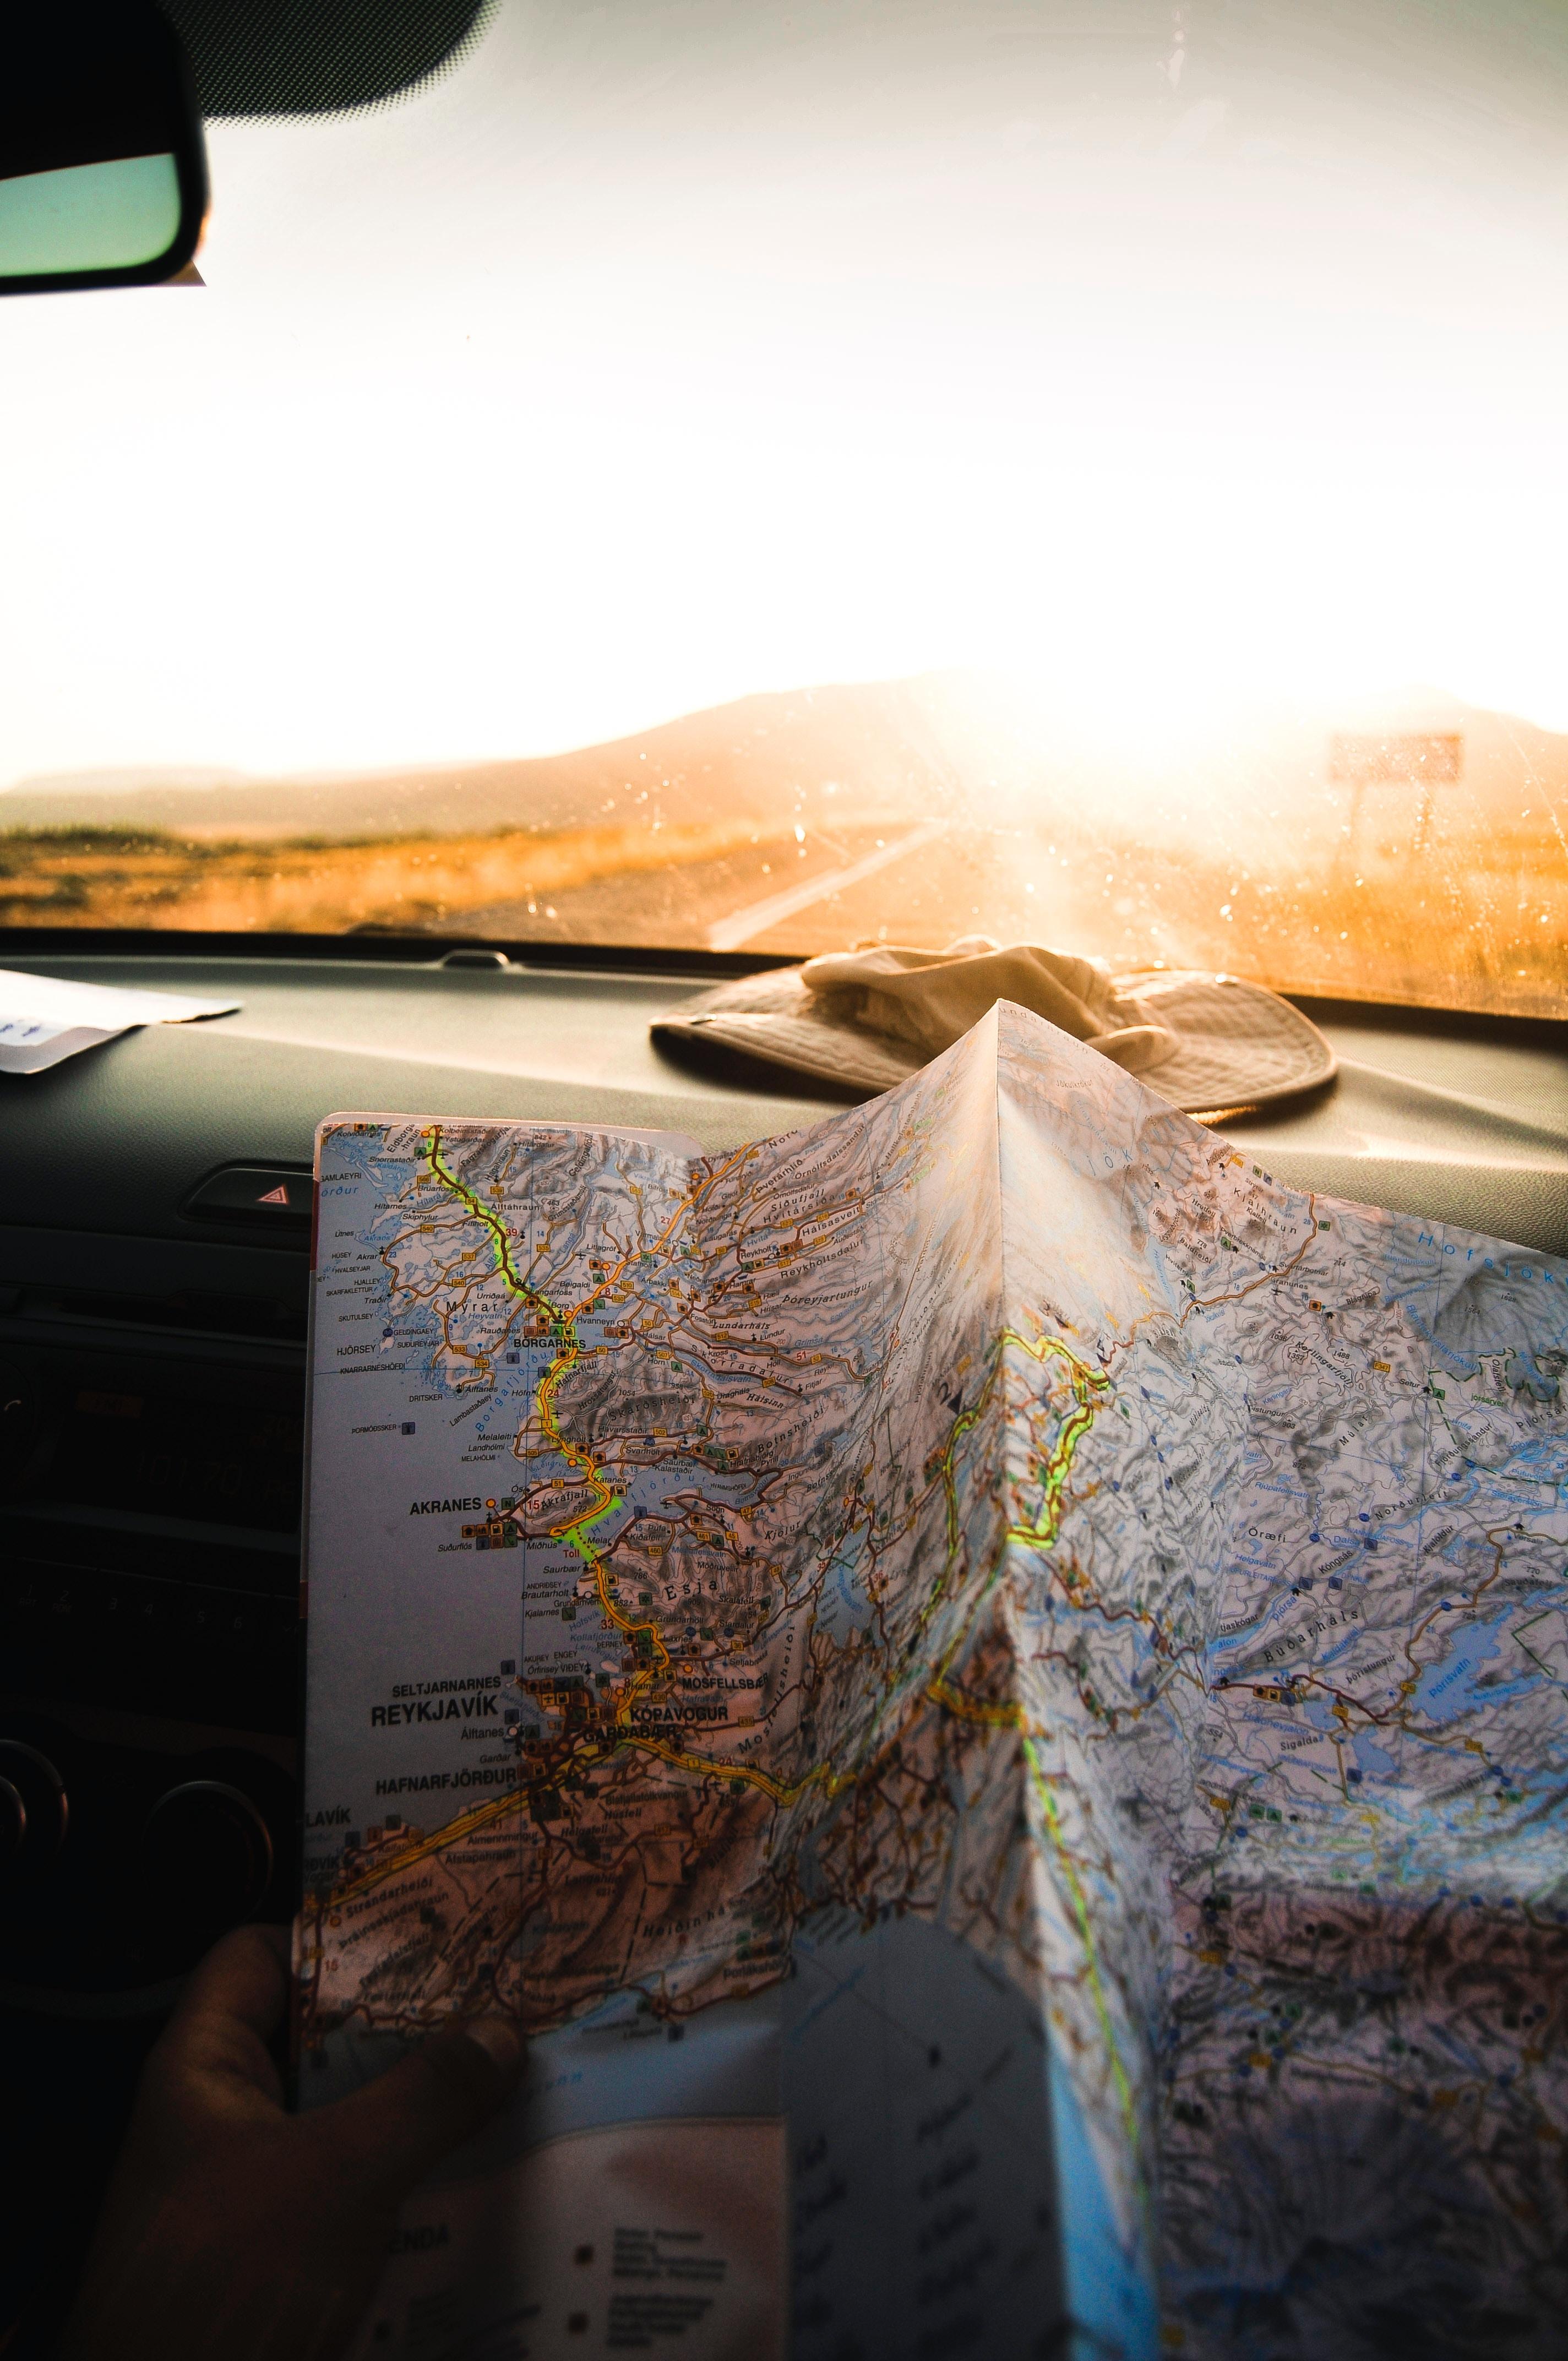 Un mapa en un coche Photo by Julentto Photography